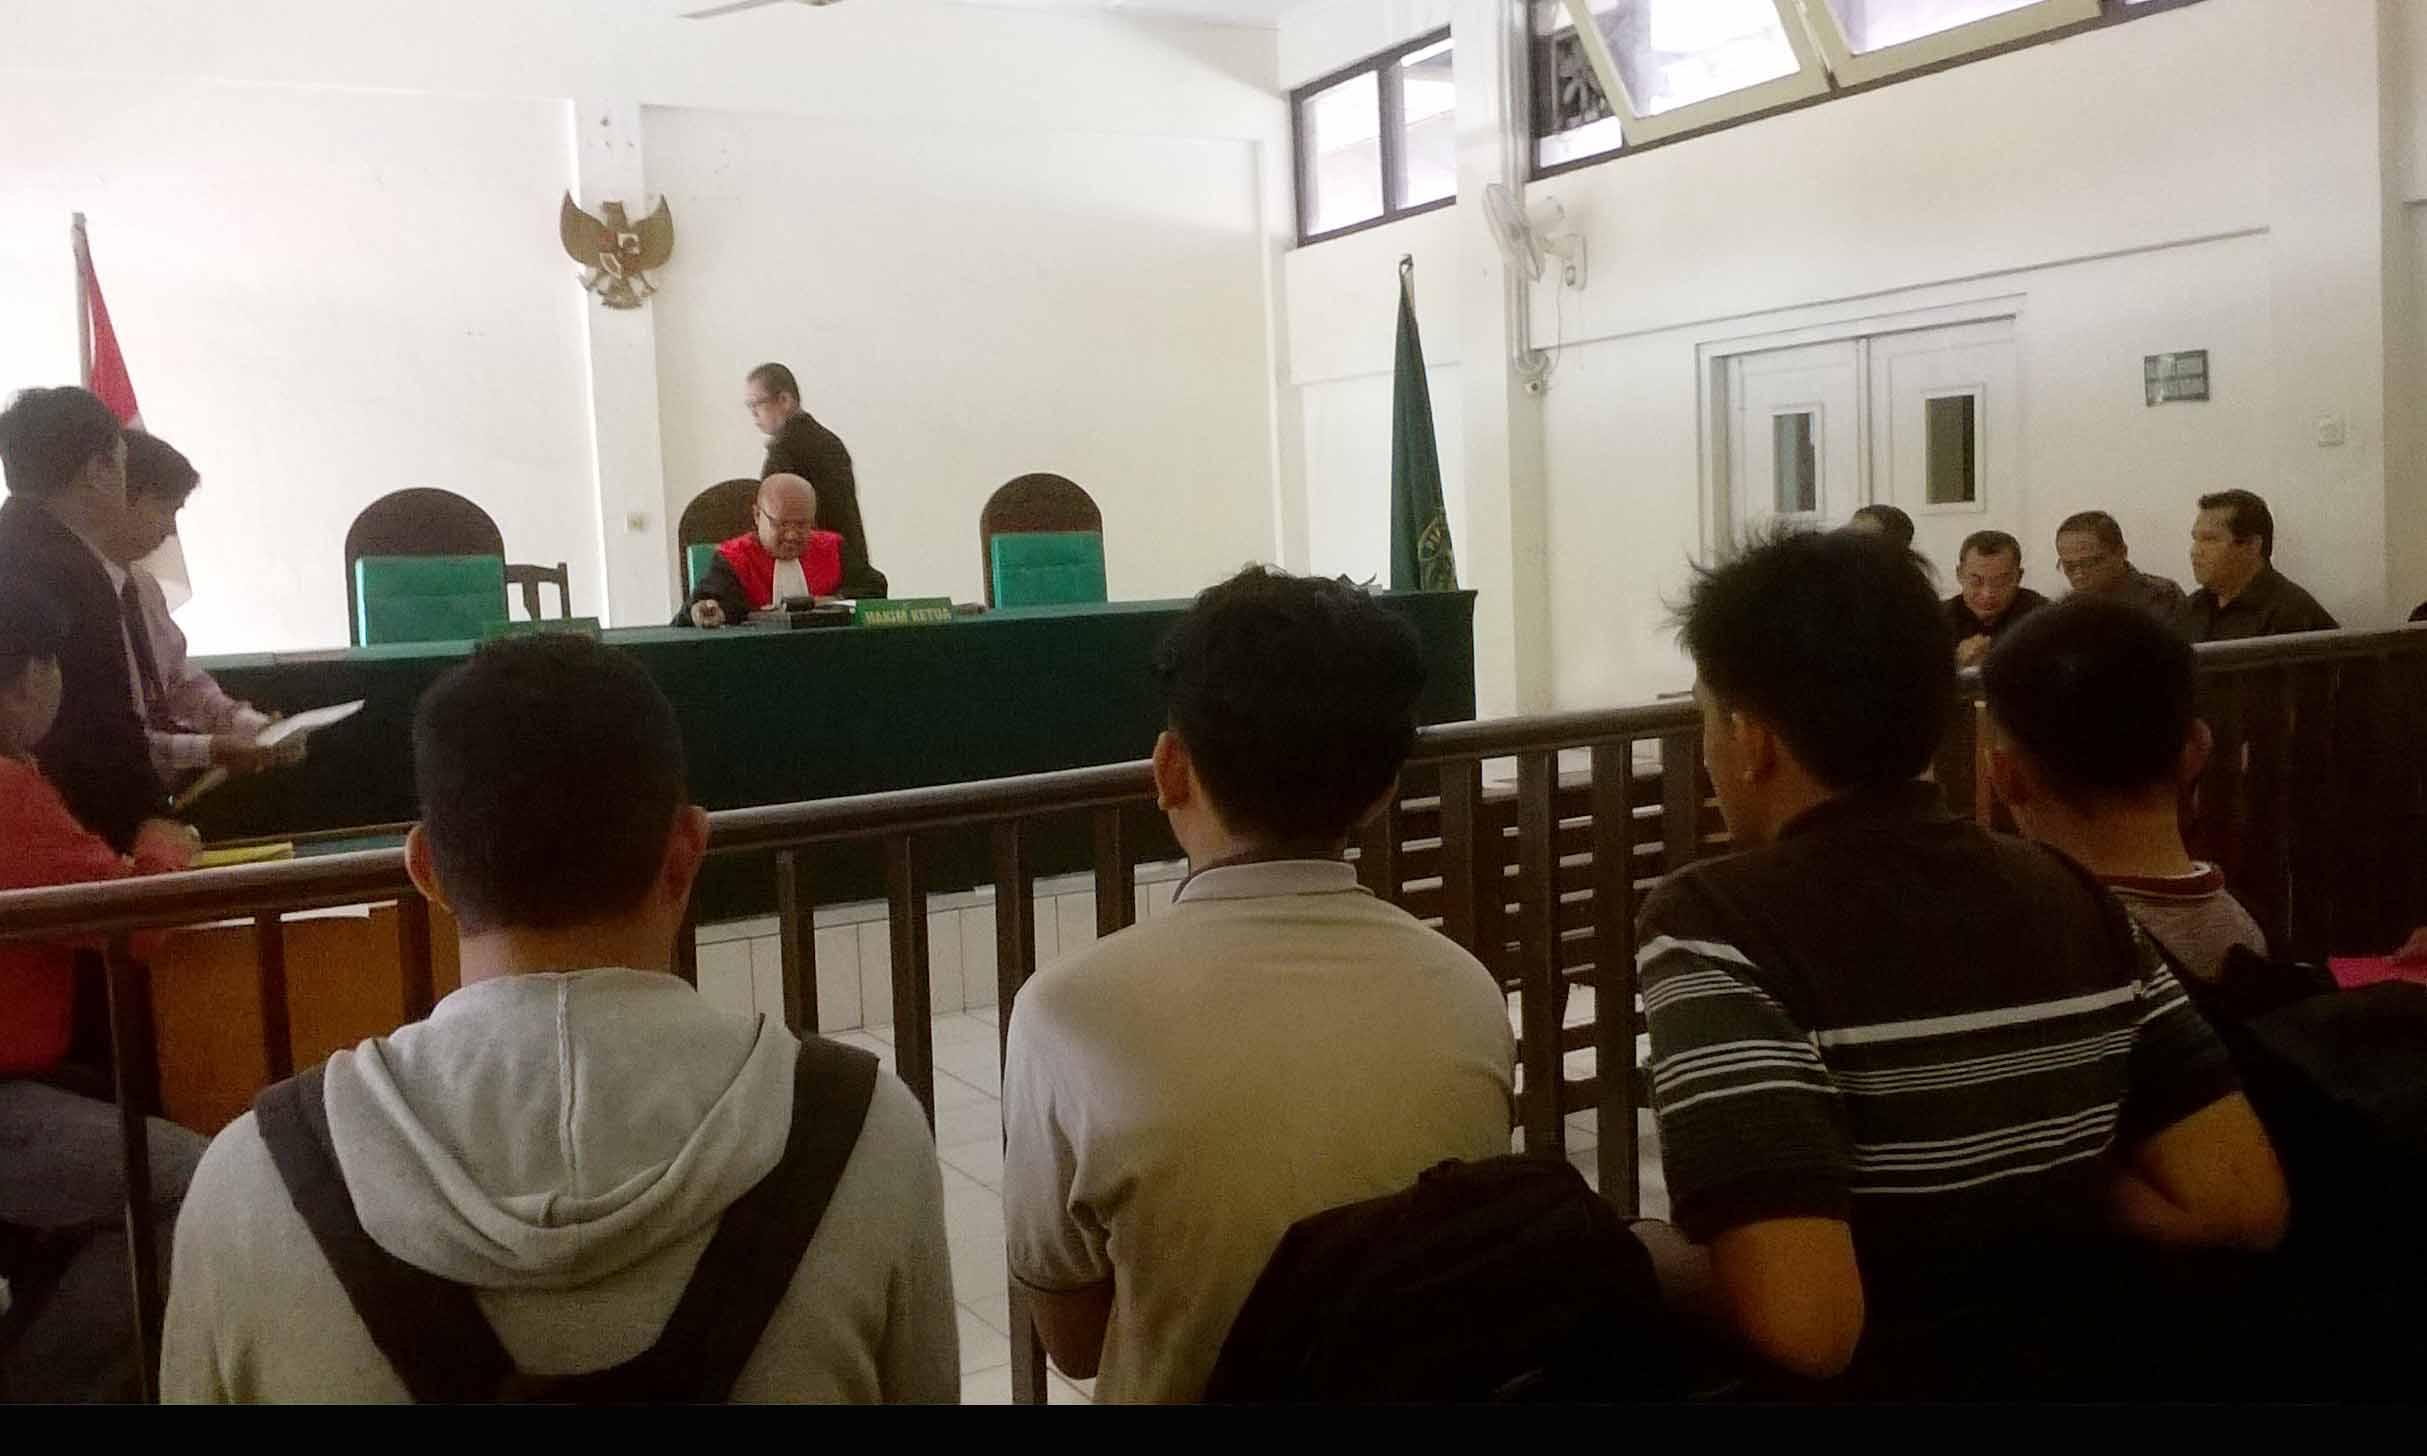 Foto : Ellyvon Suasana ruang sidang Pengadilan Negeri Palembang. Saat hakim ketua memulai persidangan pra peradilan pertama atas kasus penggelapan uang oleh Sri Farida dari yang dituntut oleh Amirudin. Senin (7/3/2016)